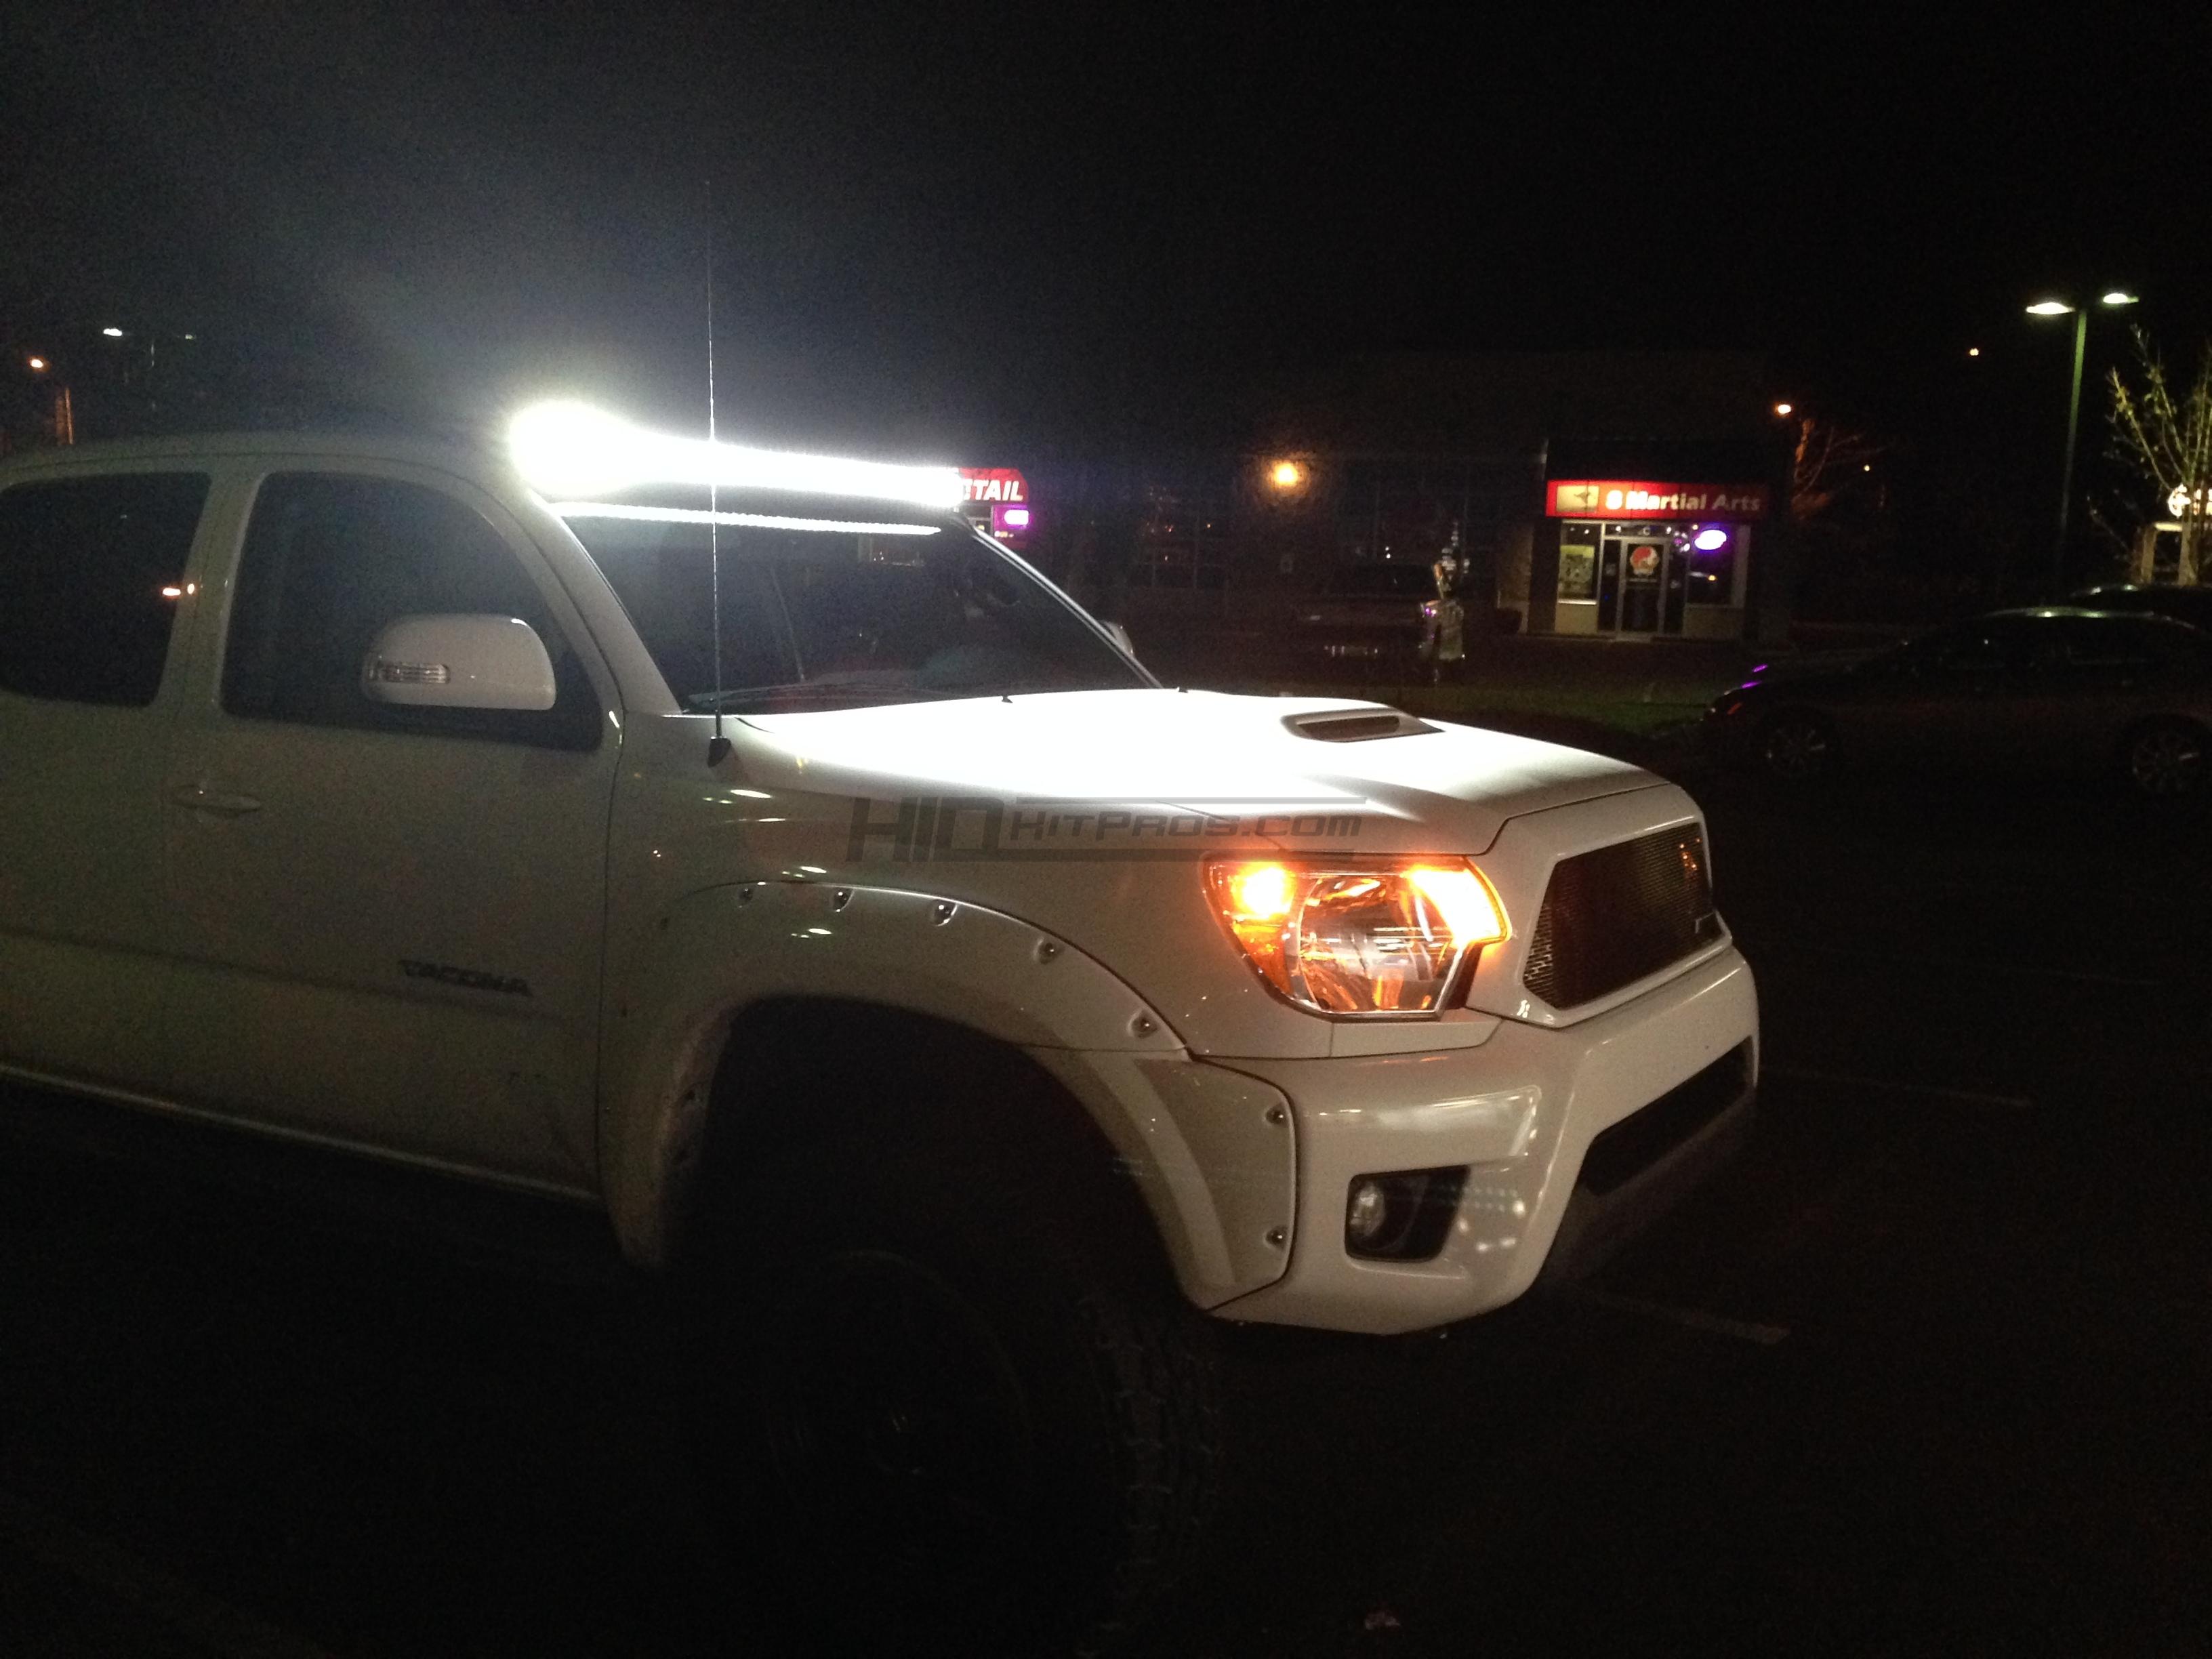 2005 2019 Toyota Tacoma 50 Light Bar Roof Brackets Hid Kit Pros